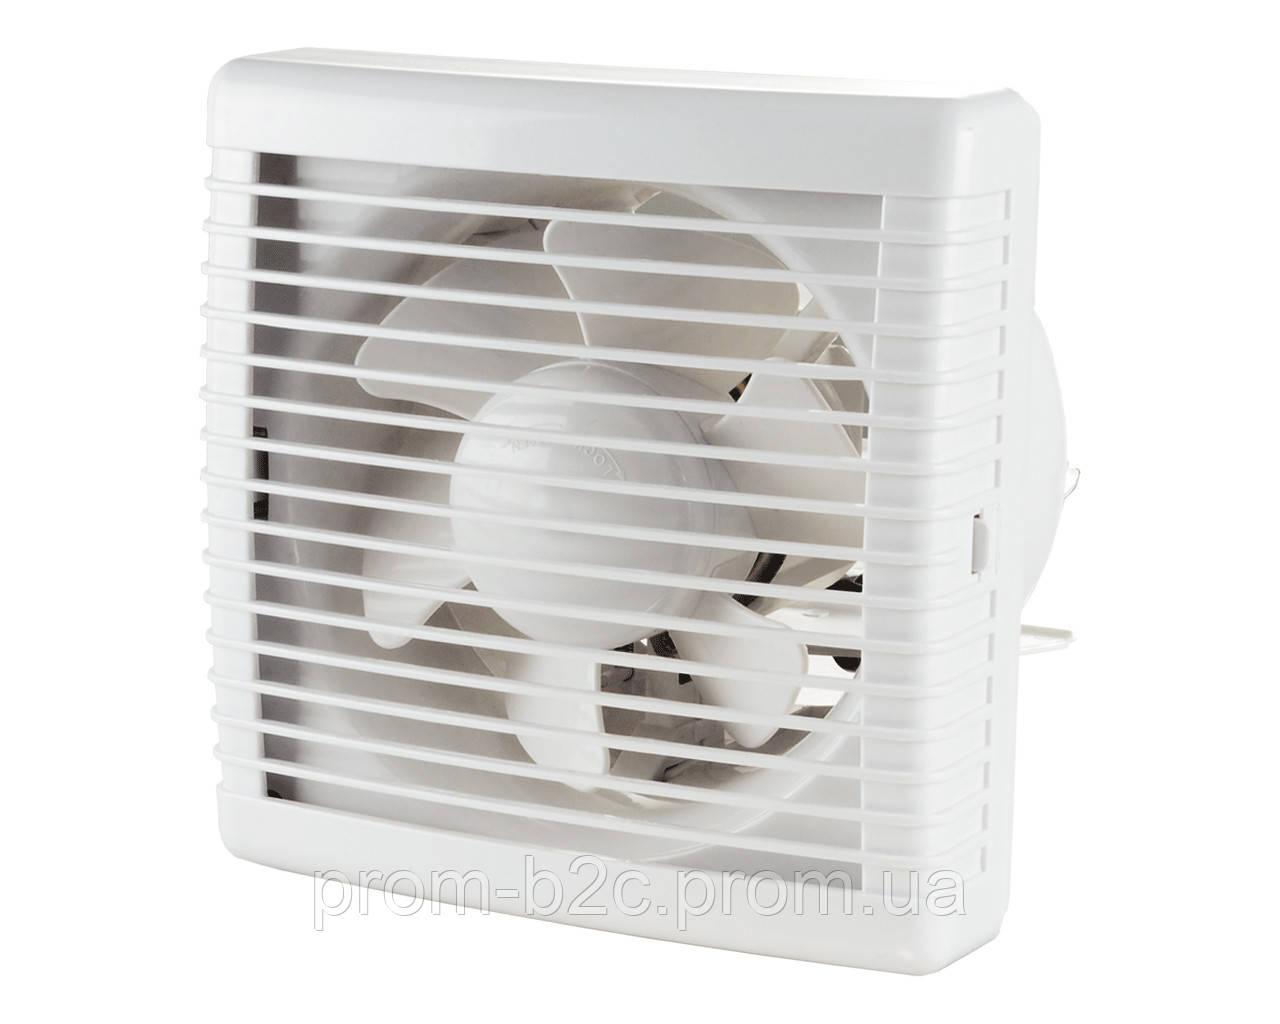 Вентилятор Домовент 180 ВВР